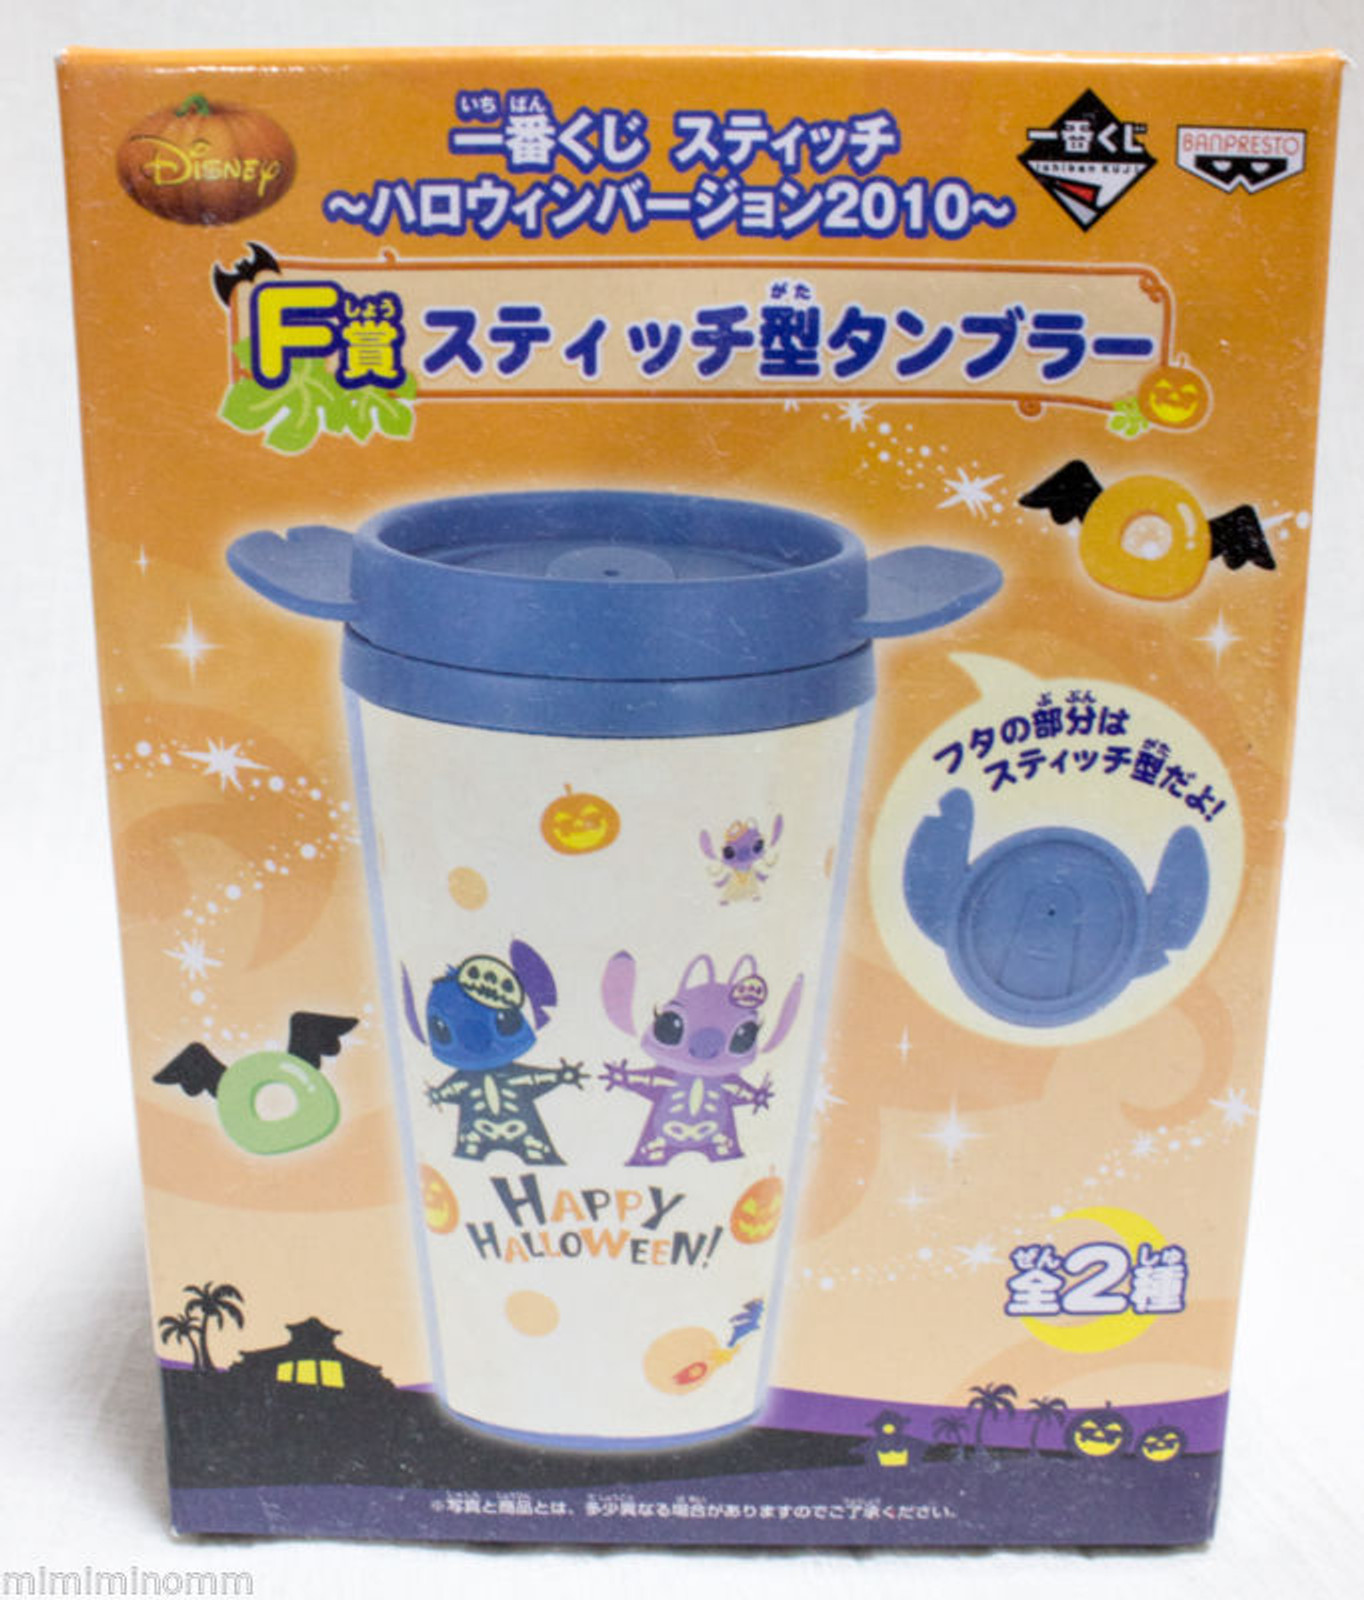 Disney Stitch Happy Halloween Tumbler Banpresto JAPAN ANIME